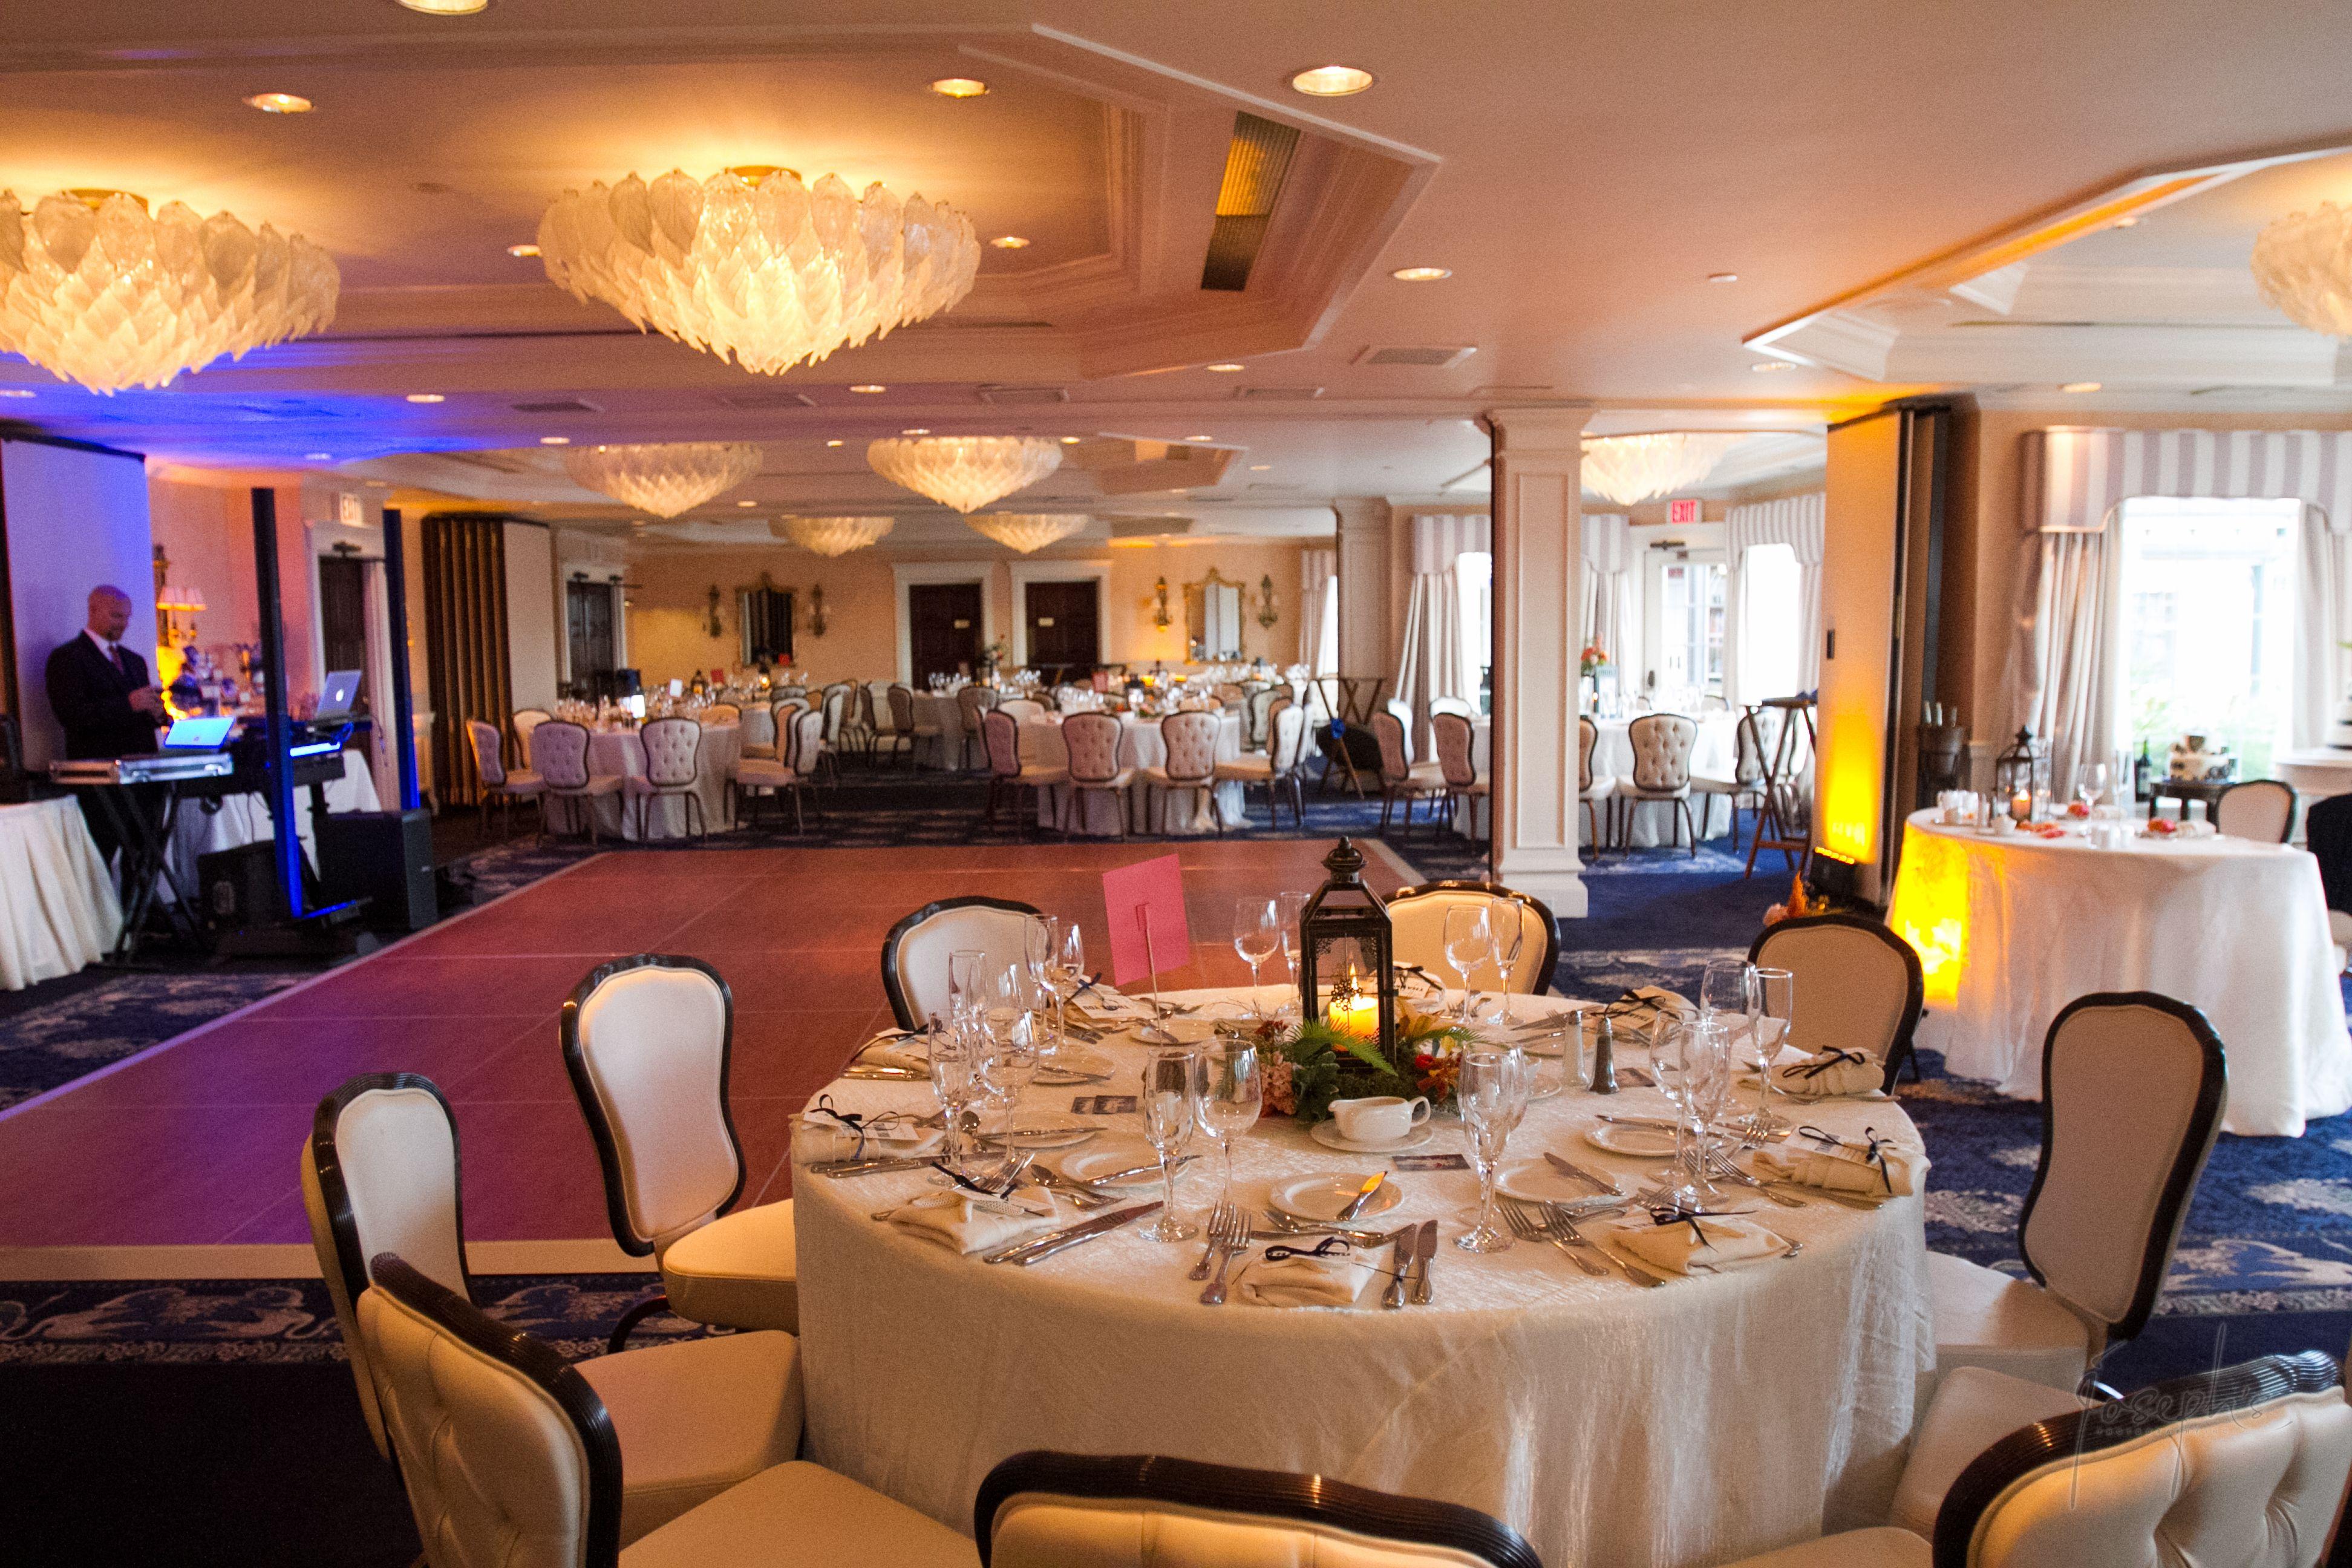 Inn at old saybrook wedding venues